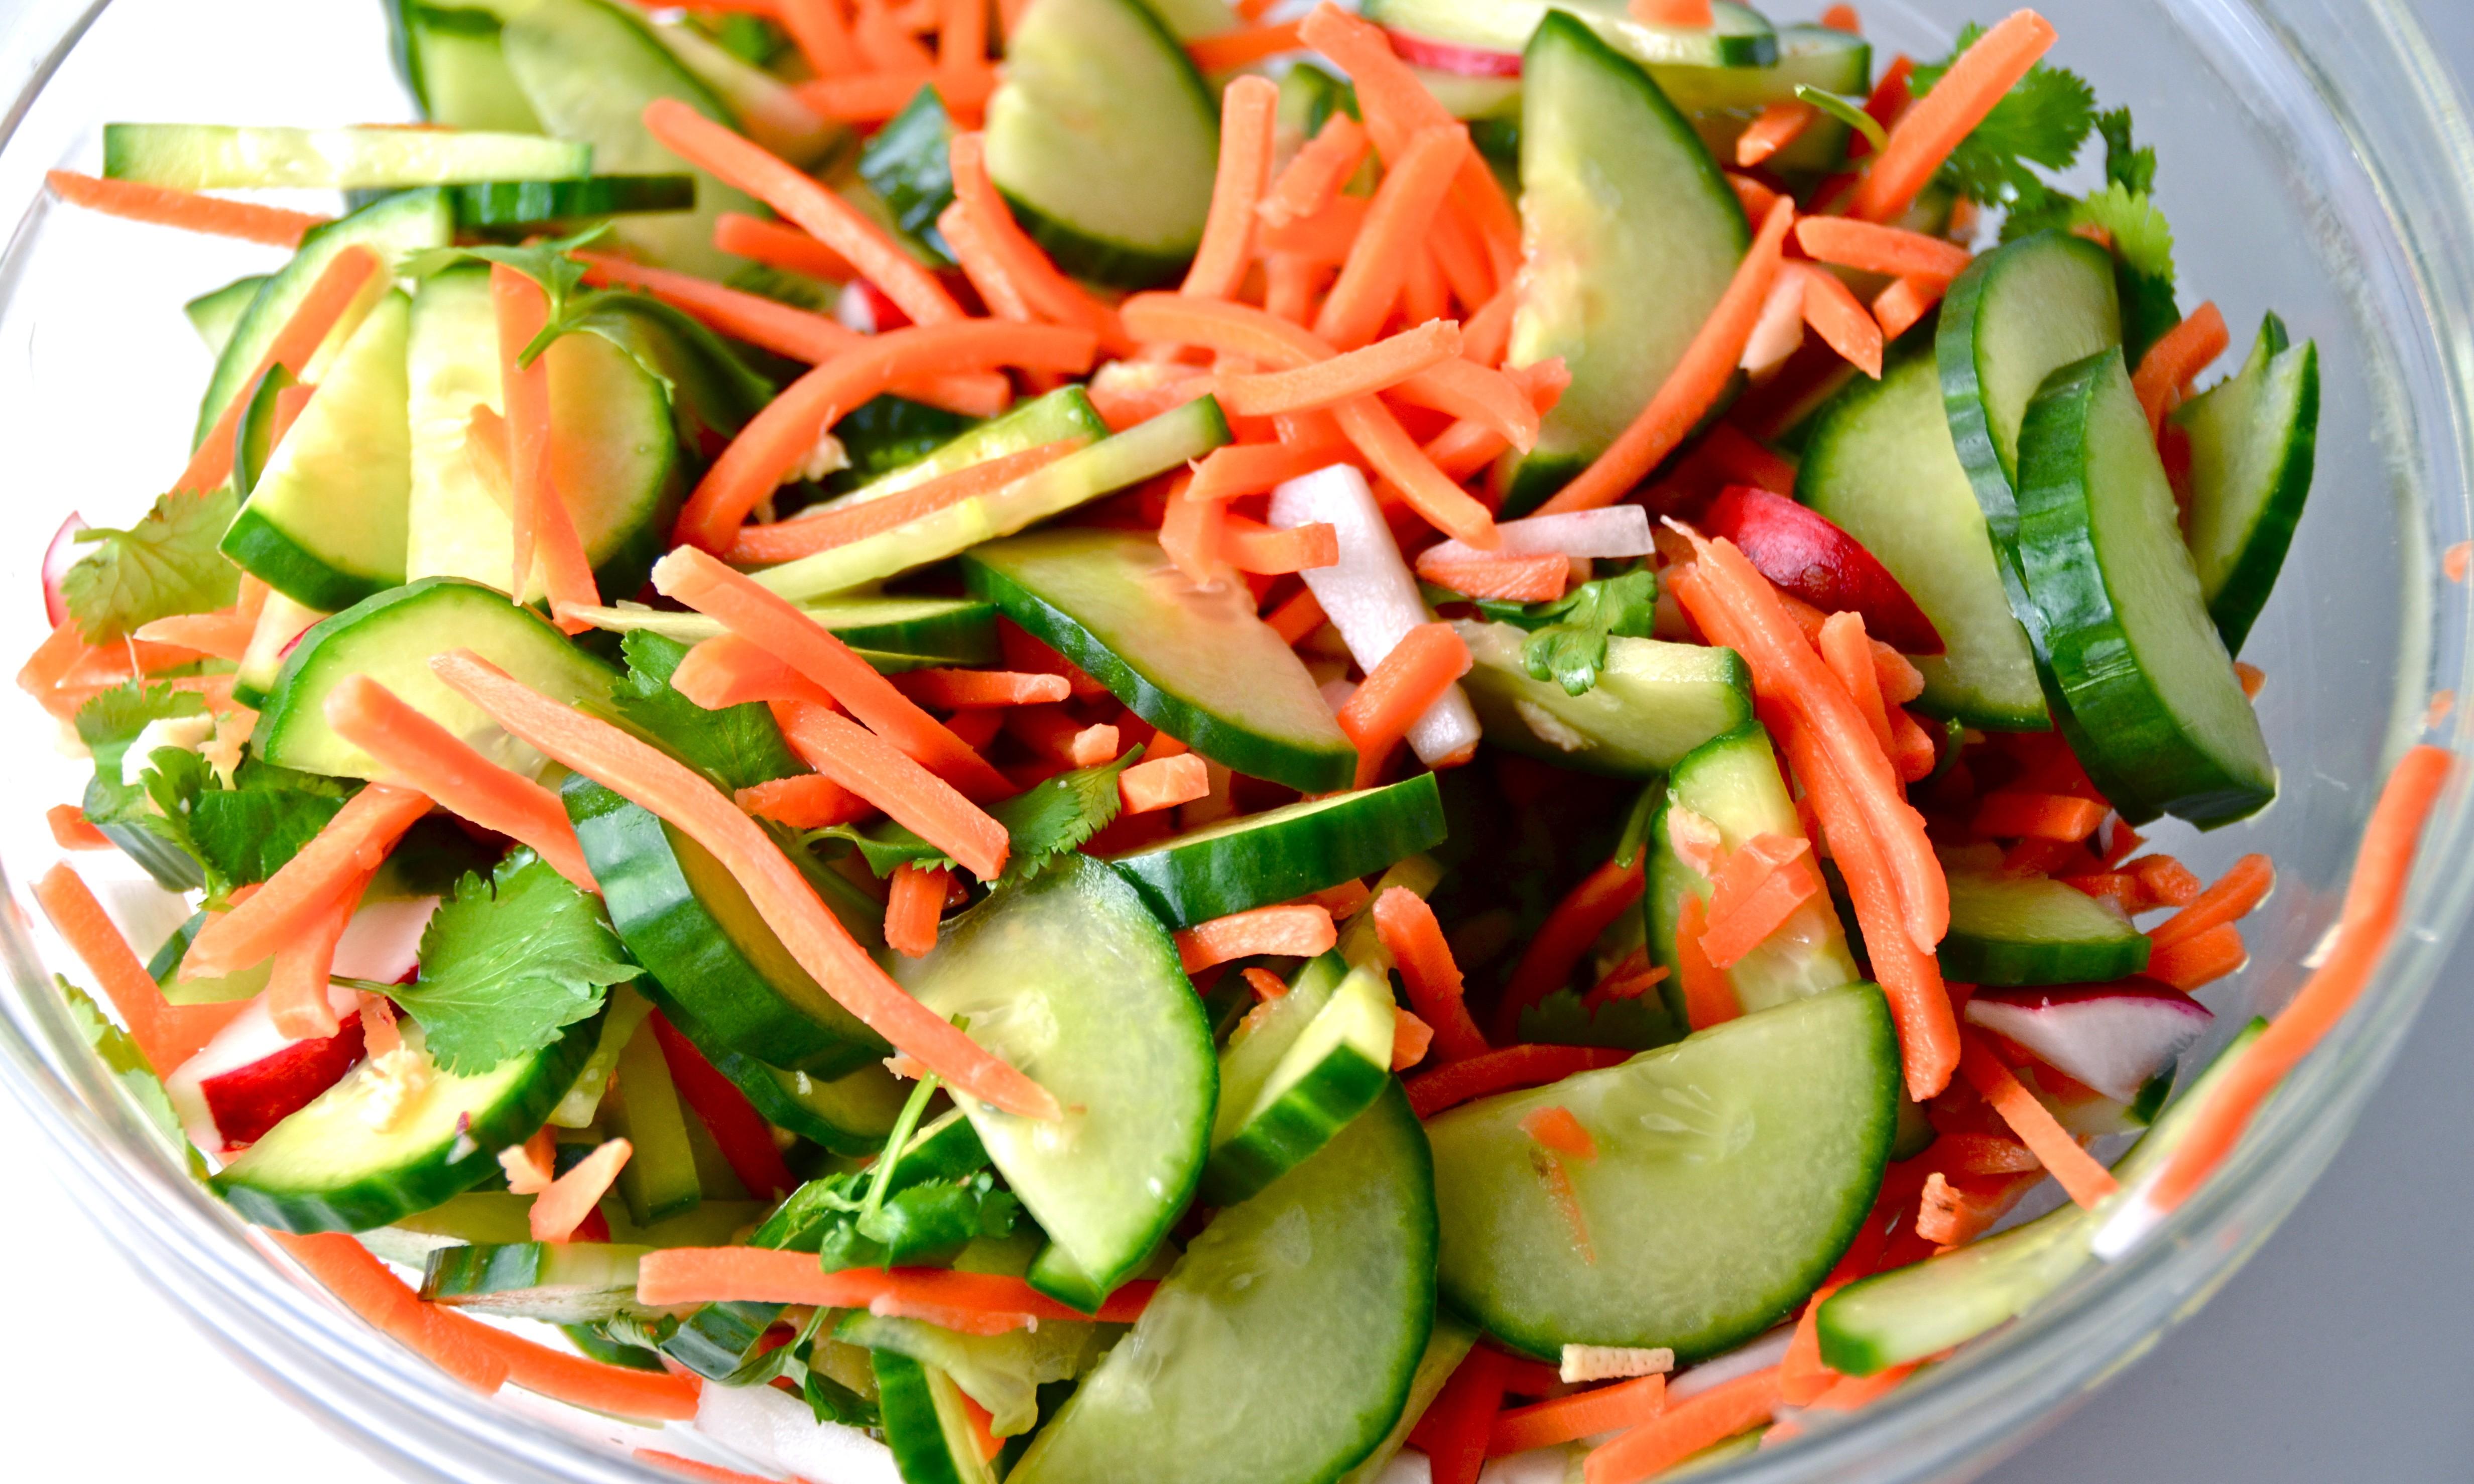 Салат из капусты огурца моркови рецепт с